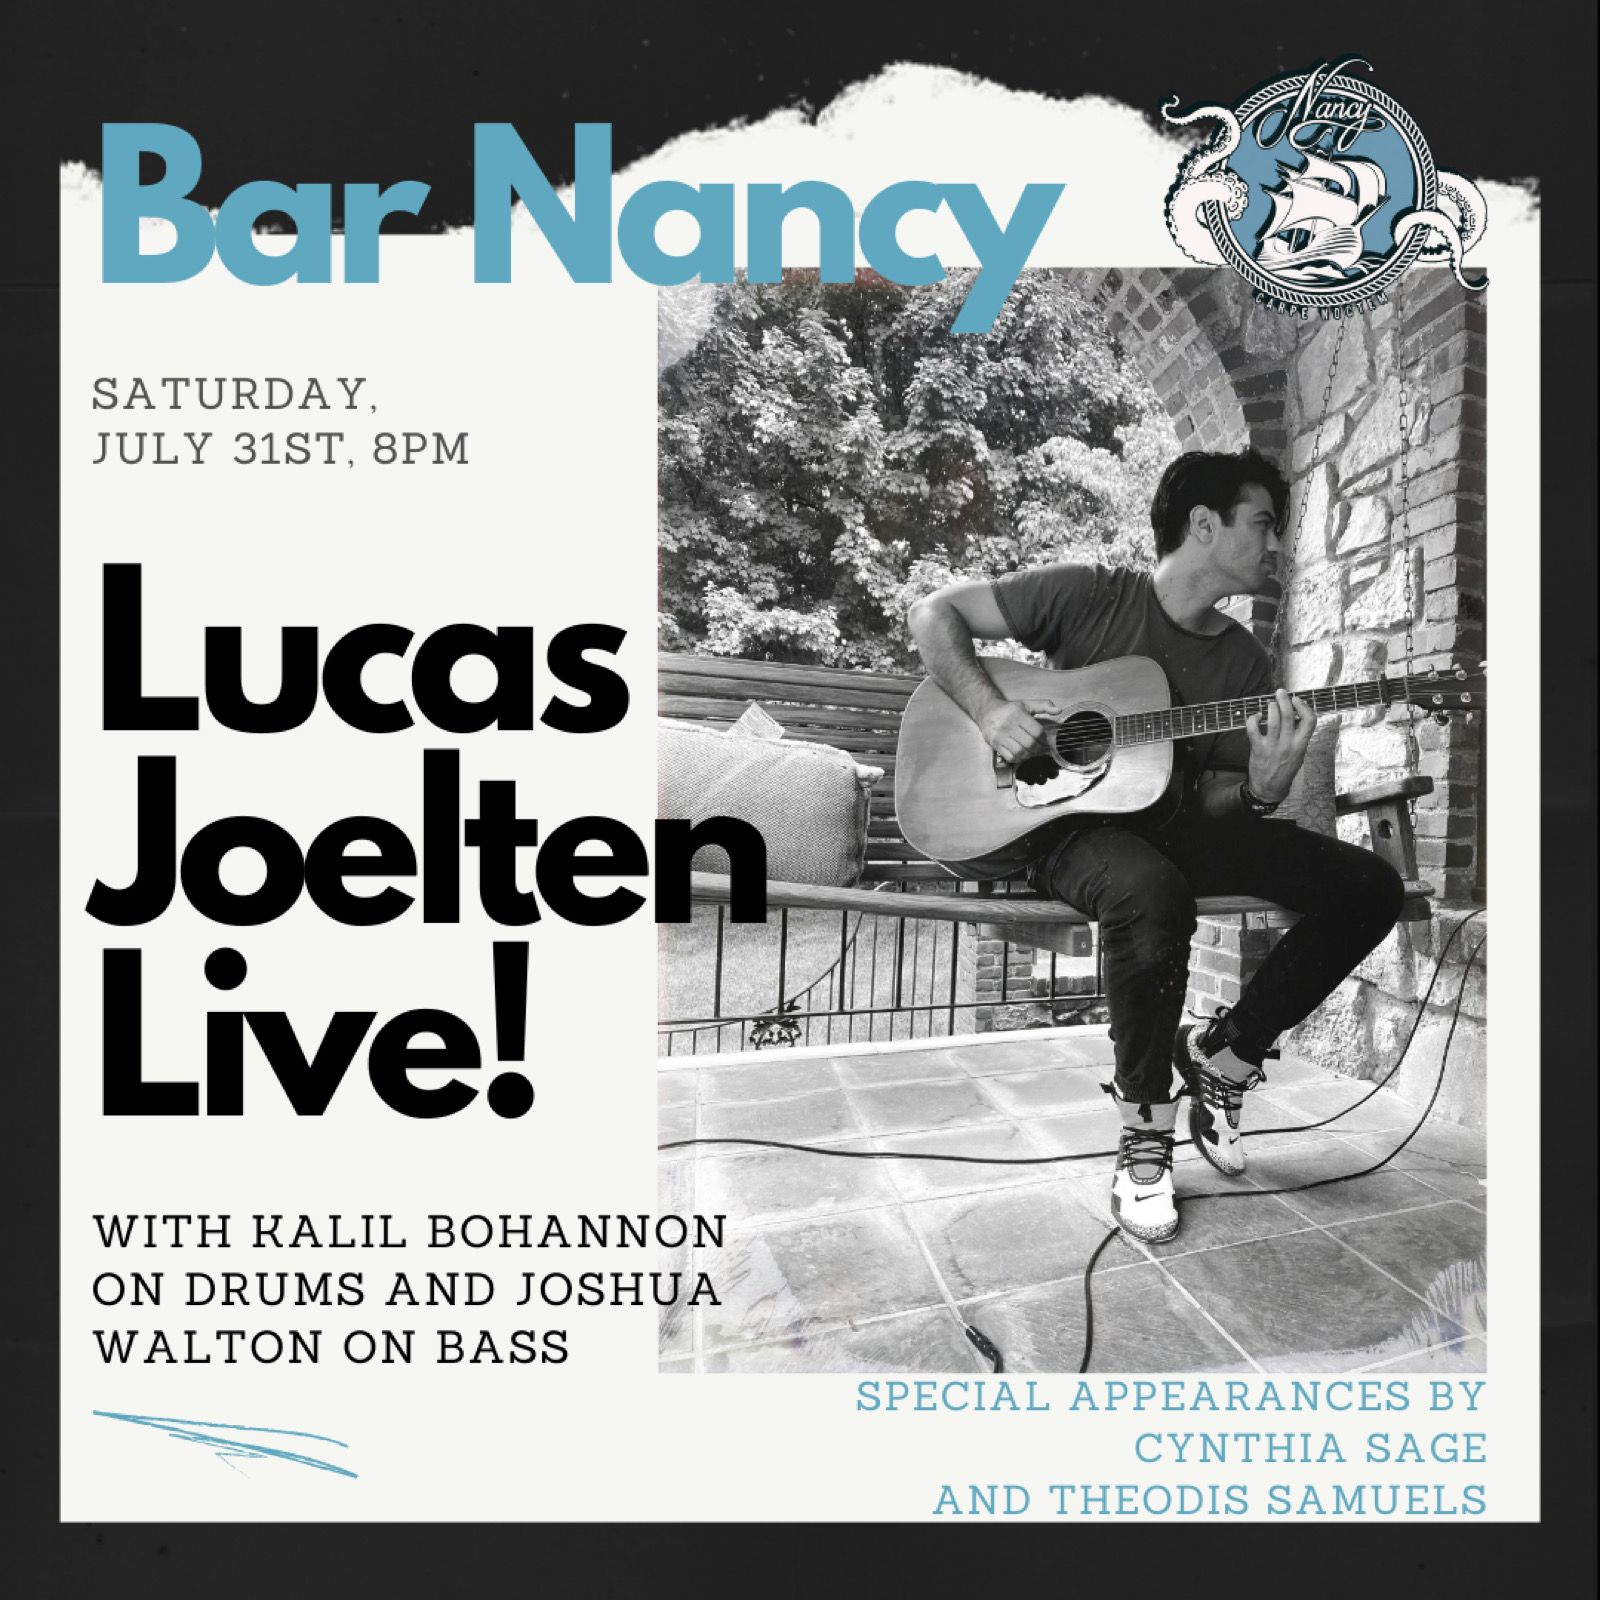 Lucas Joelten Live at Bar Nancy - July 31 at 8PM